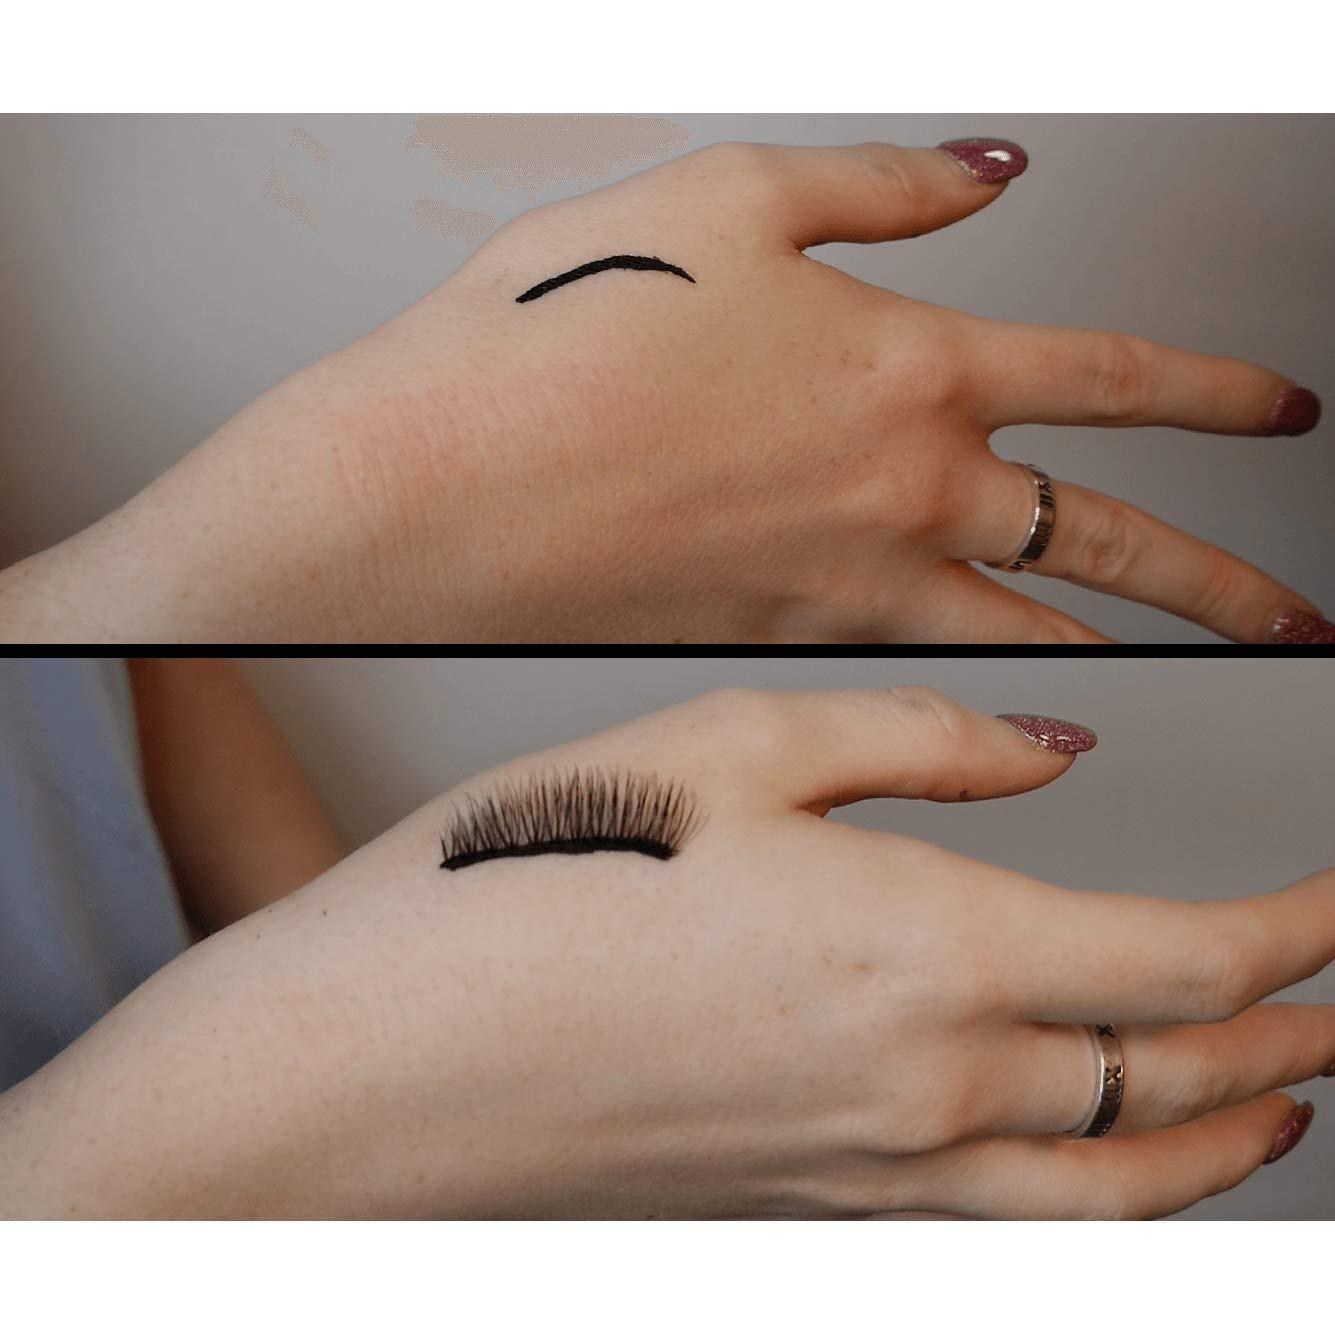 Day to Night Magnetic Eyeliner and Eyelash Kit - Reusable Silk False Lashes - Natural Look [No Glue] - By Clevermore Essentials by Clevermore Essentials, LLC. (Image #6)